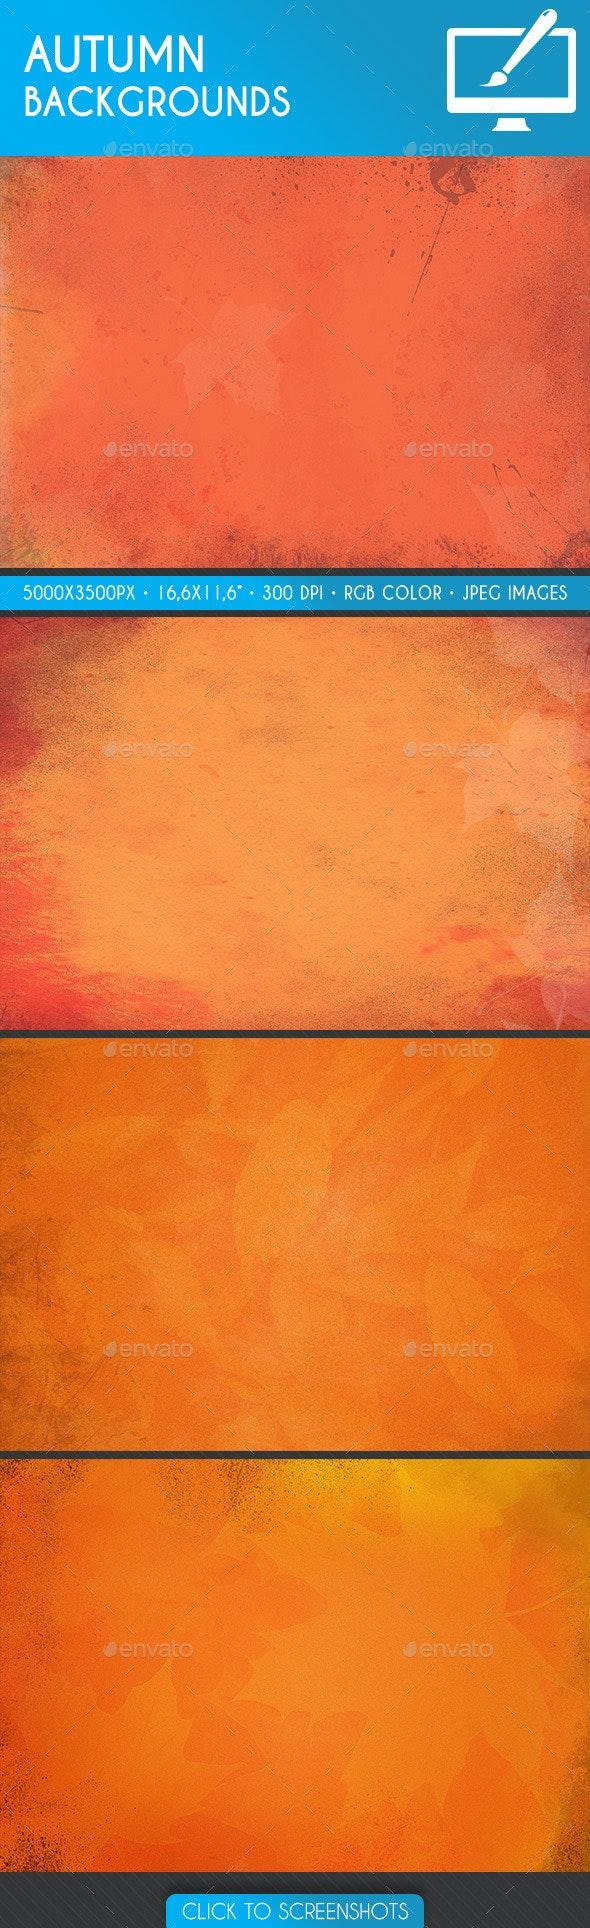 Autumn Backgrounds - Backgrounds Graphics